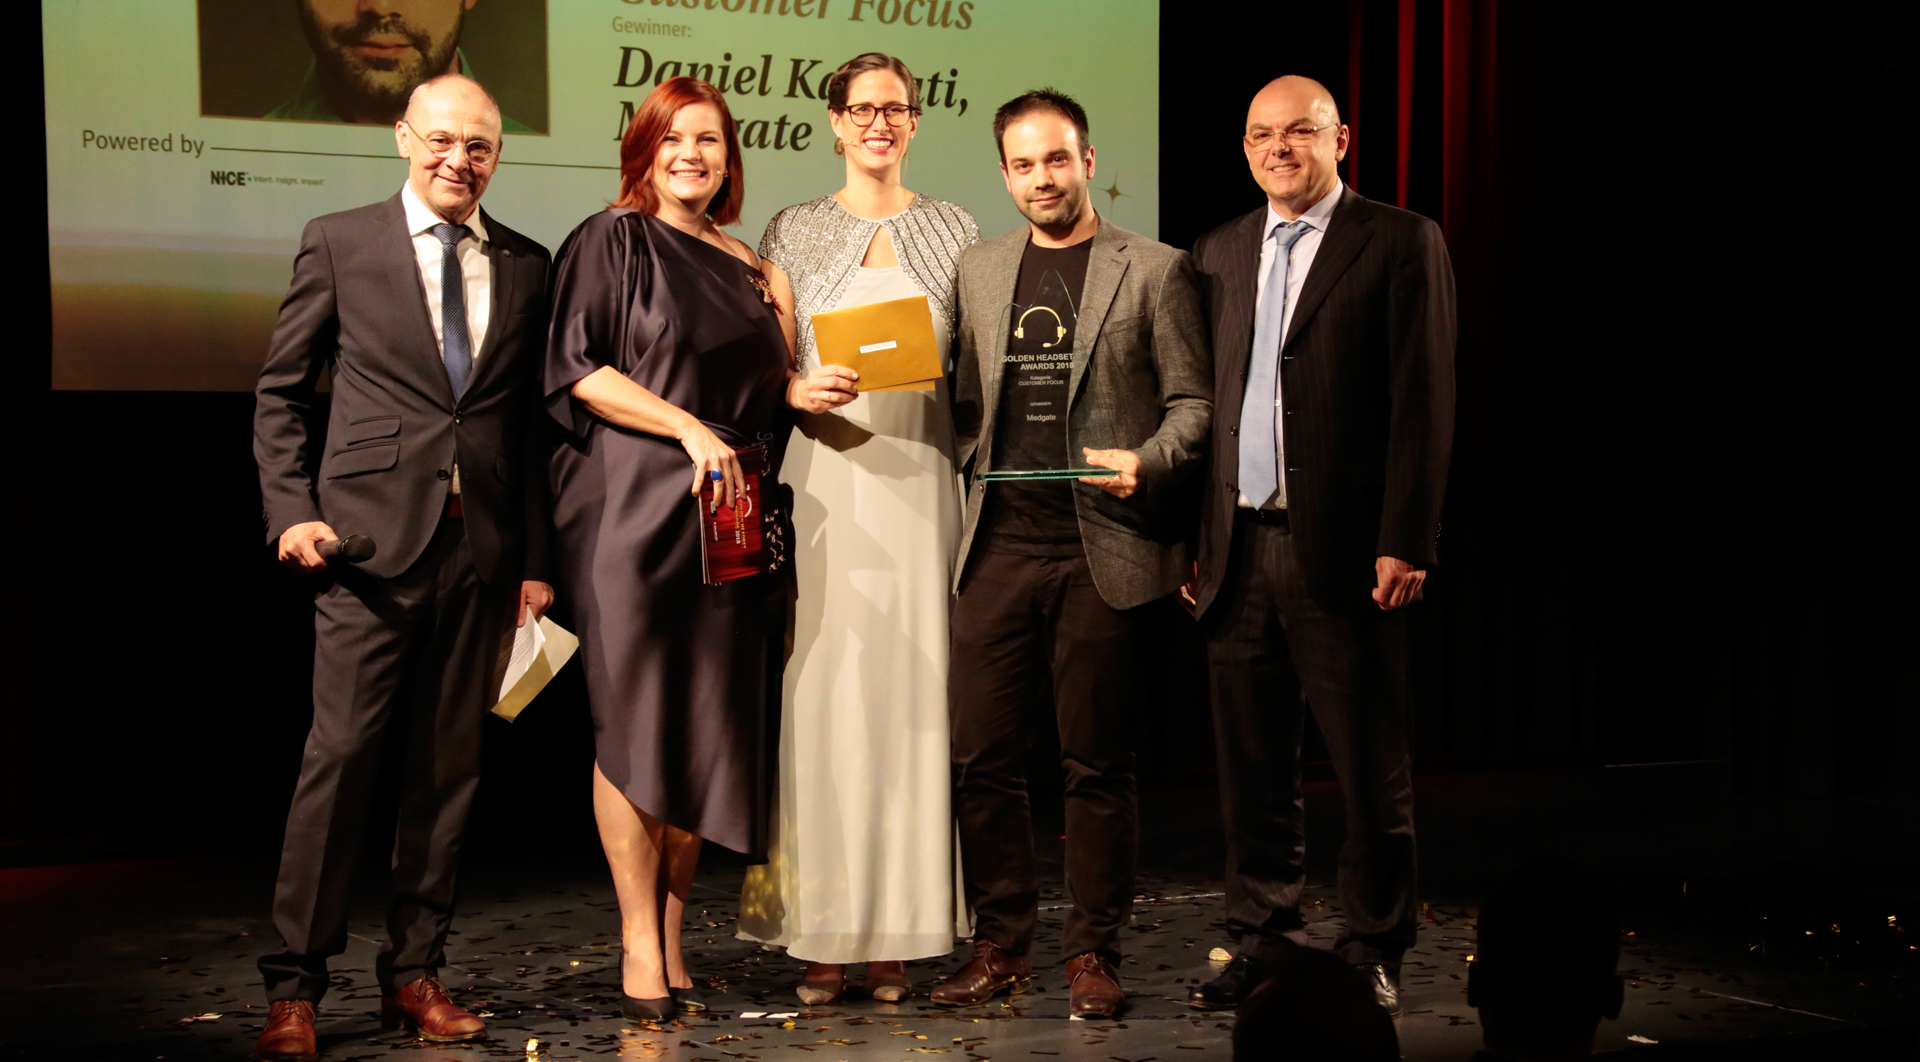 Preisträger Daniel Karpati (Medgate) im Bild mit Laudator JJ Jossen (SBB), Mirjam Gosetti (CallNet.ch), Meike Tarabori (CMM) und Sponsor Albert Bossart (NICE)